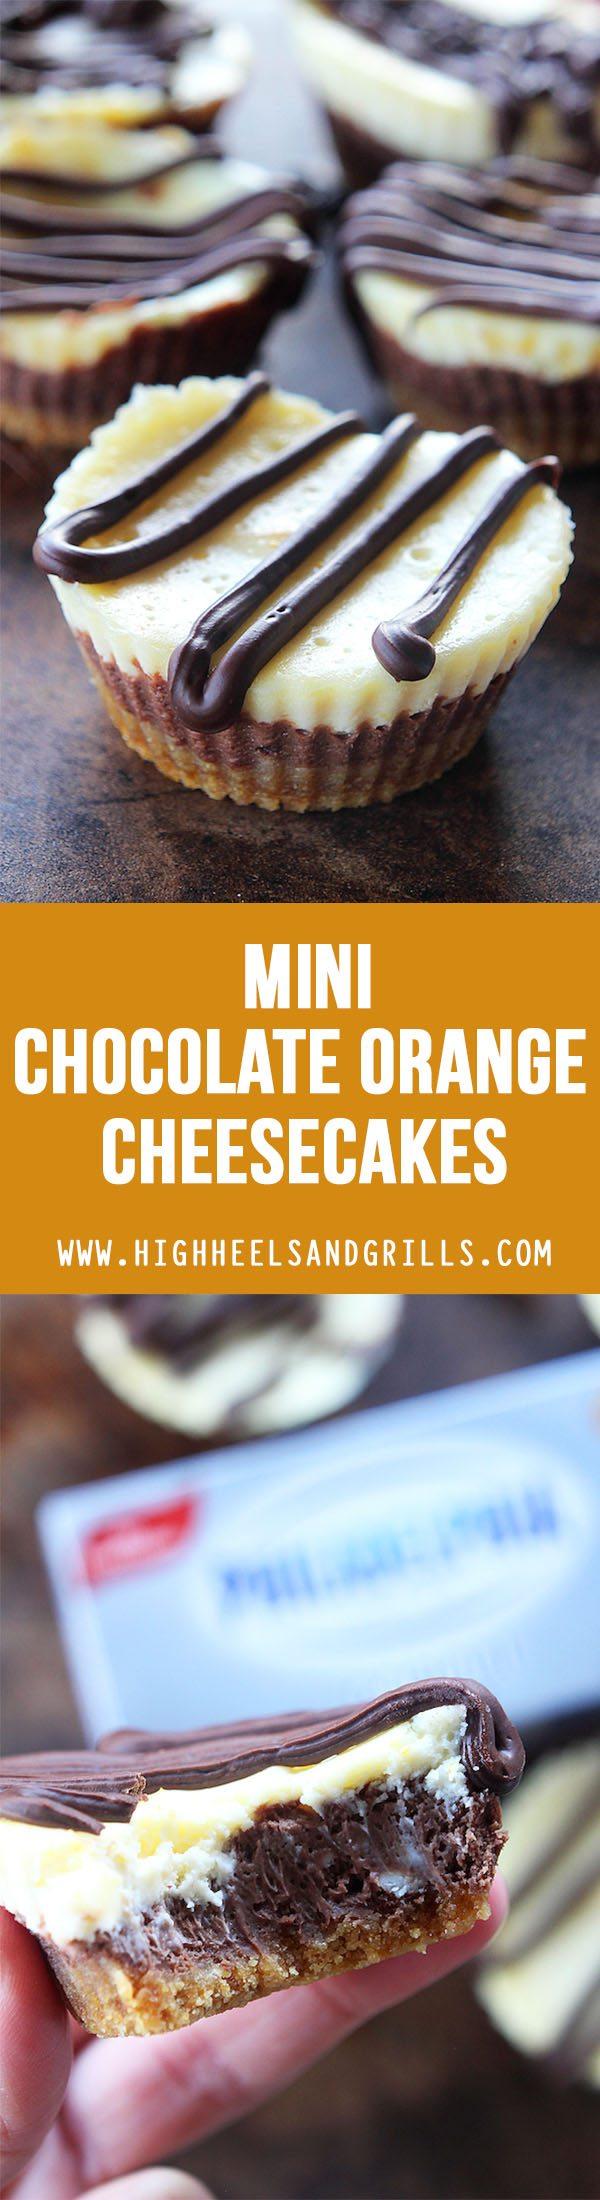 Mini Chocolate Orange Cheesecakes Collage